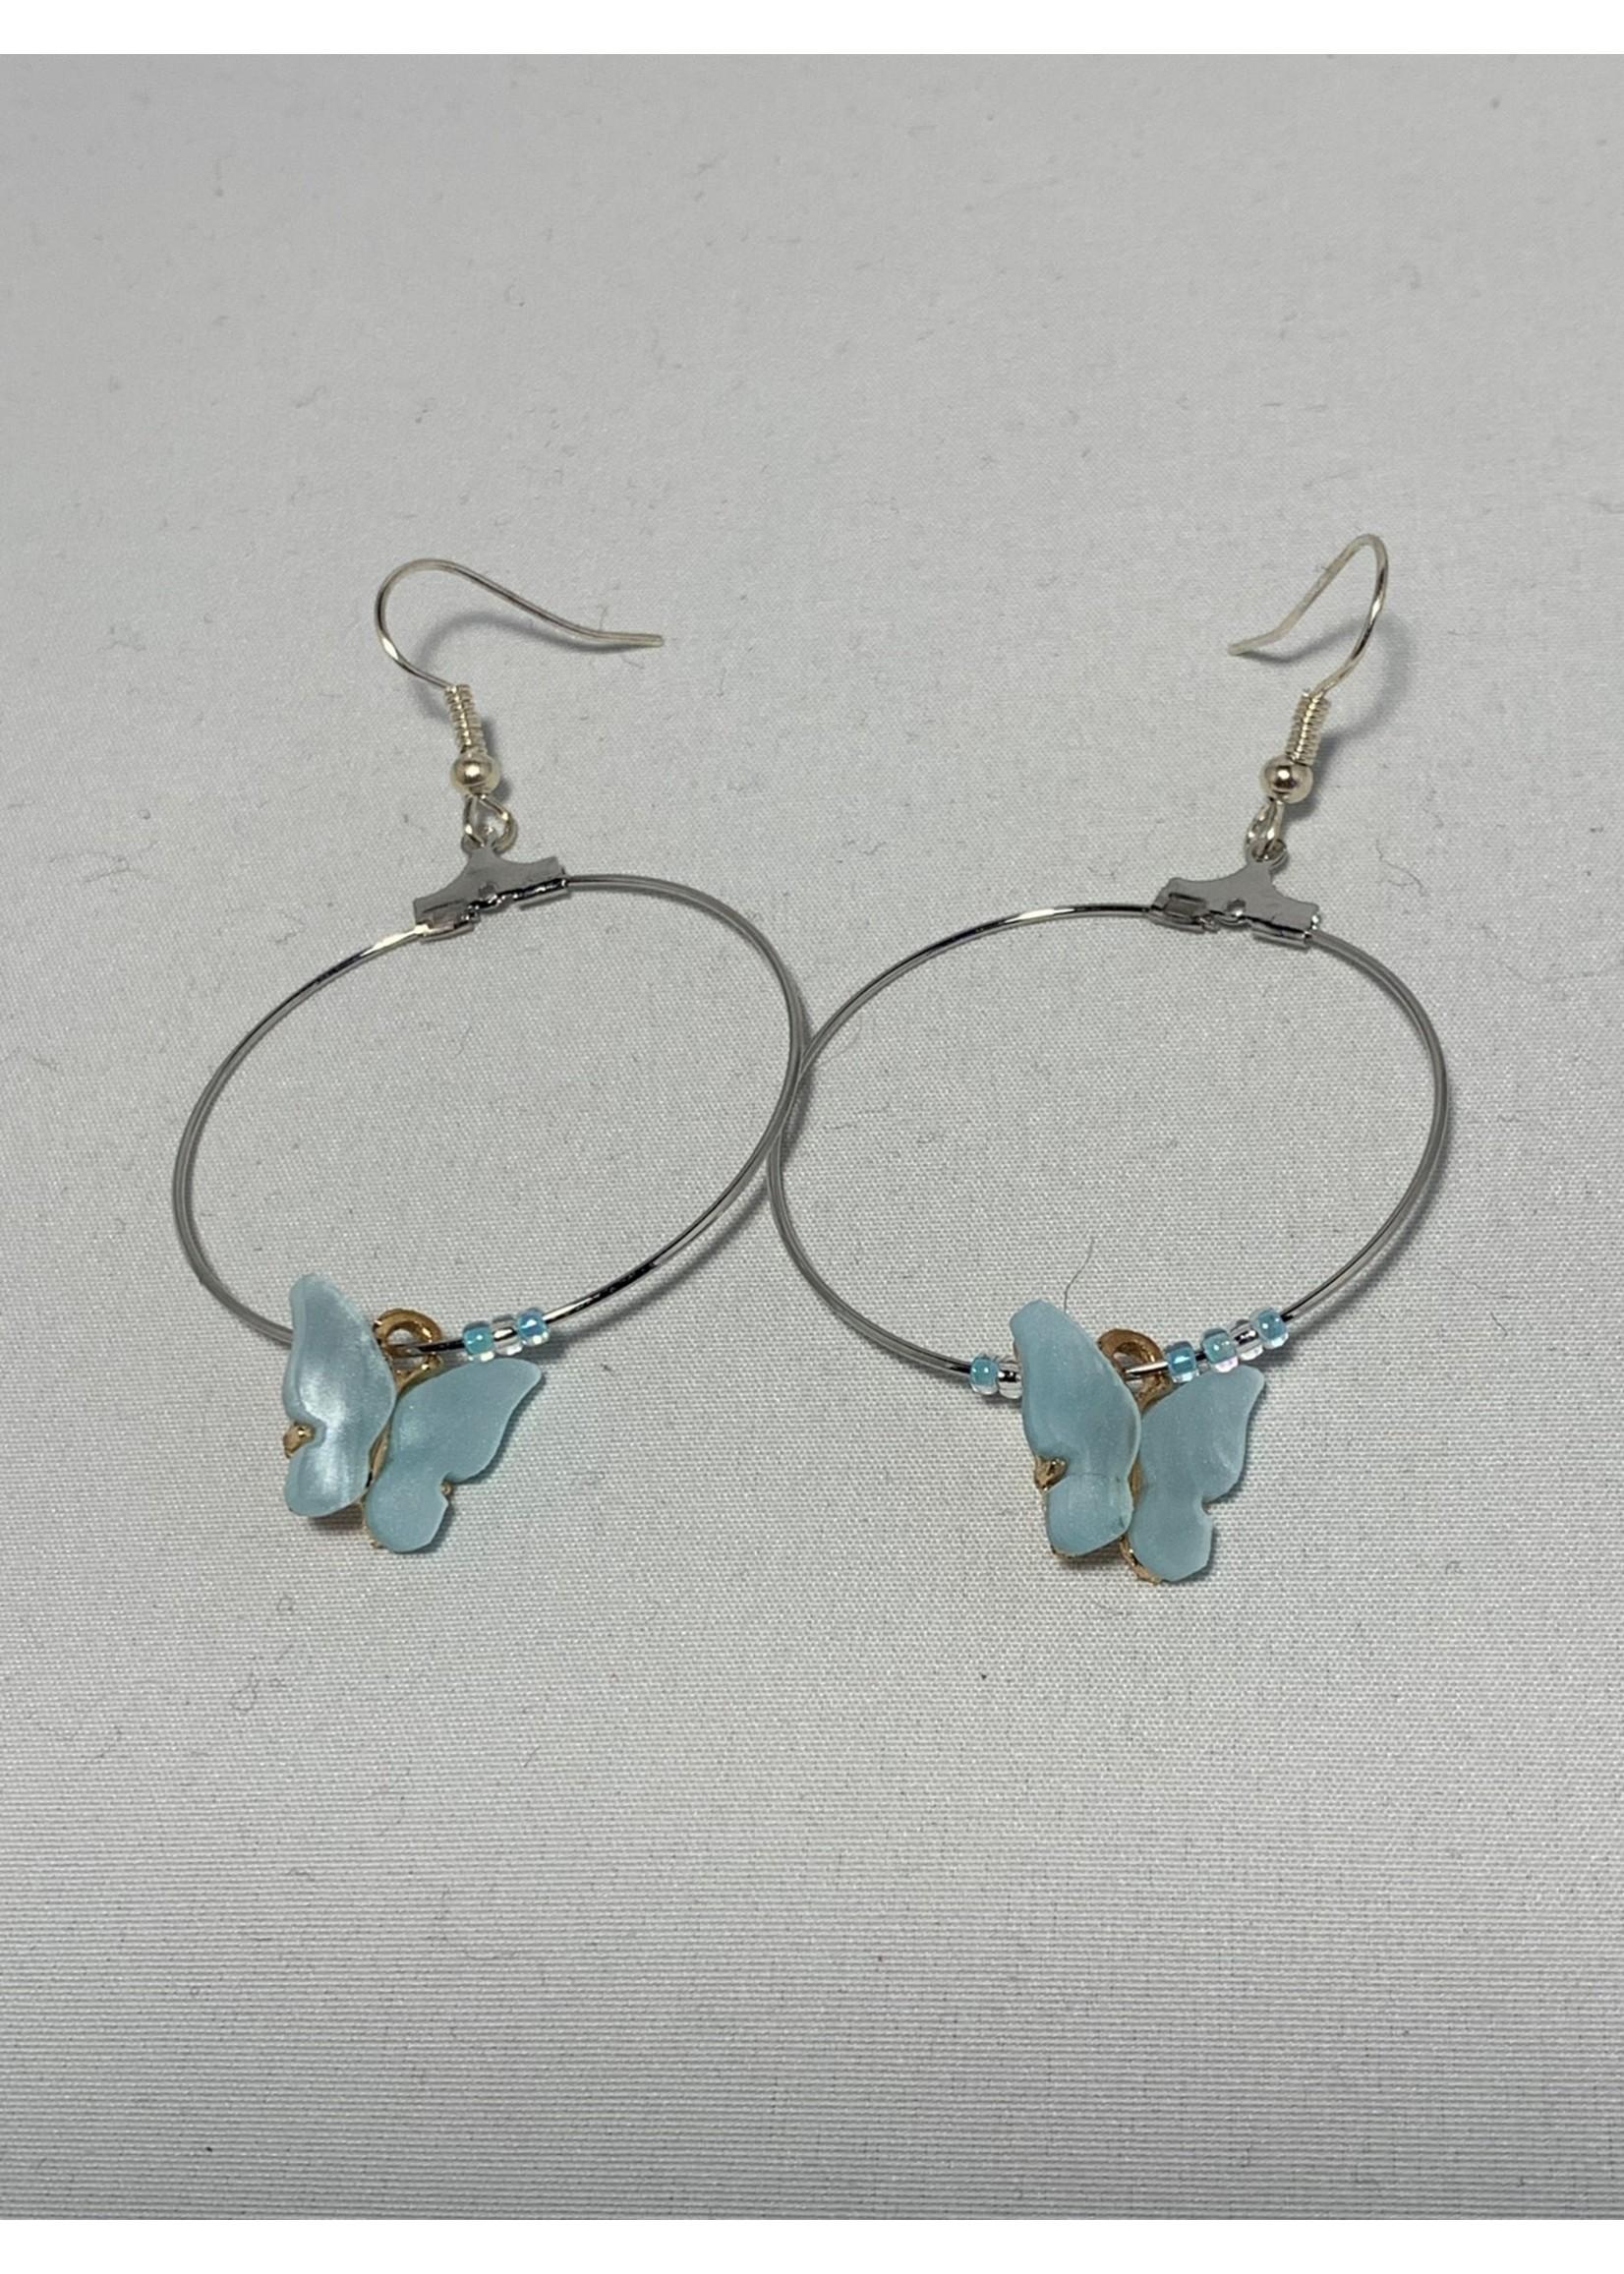 Silver Hoops with Light Blue Butterflies